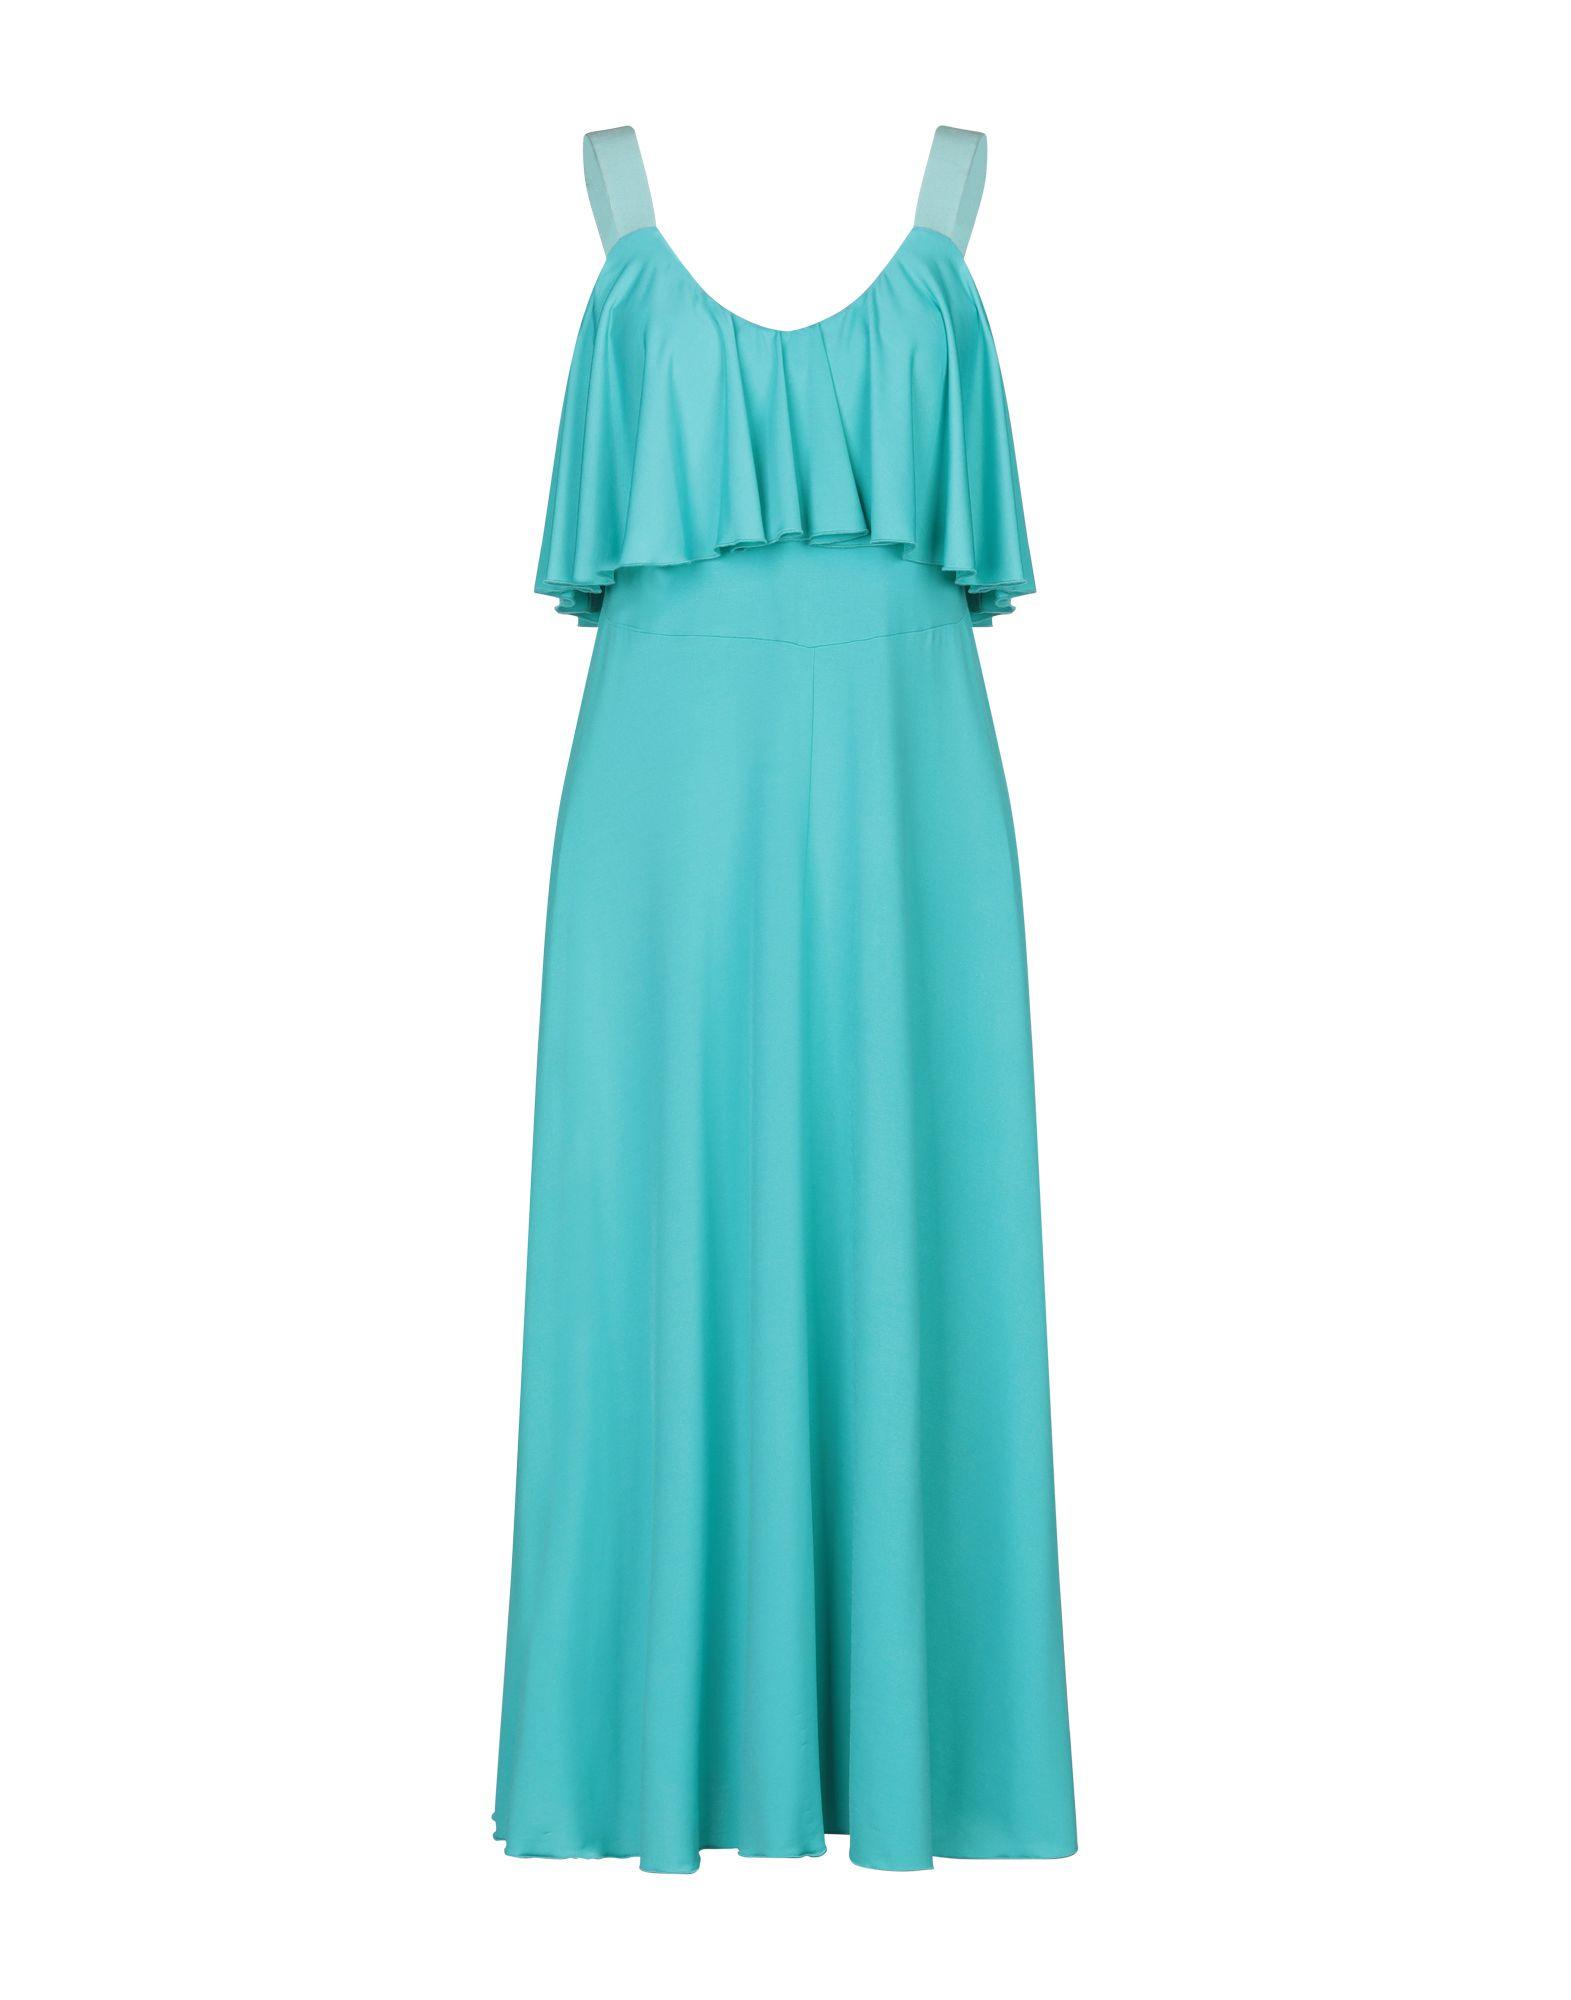 ATOS ATOS LOMBARDINI Платье длиной 3/4 violet atos lombardini юбка длиной 3 4